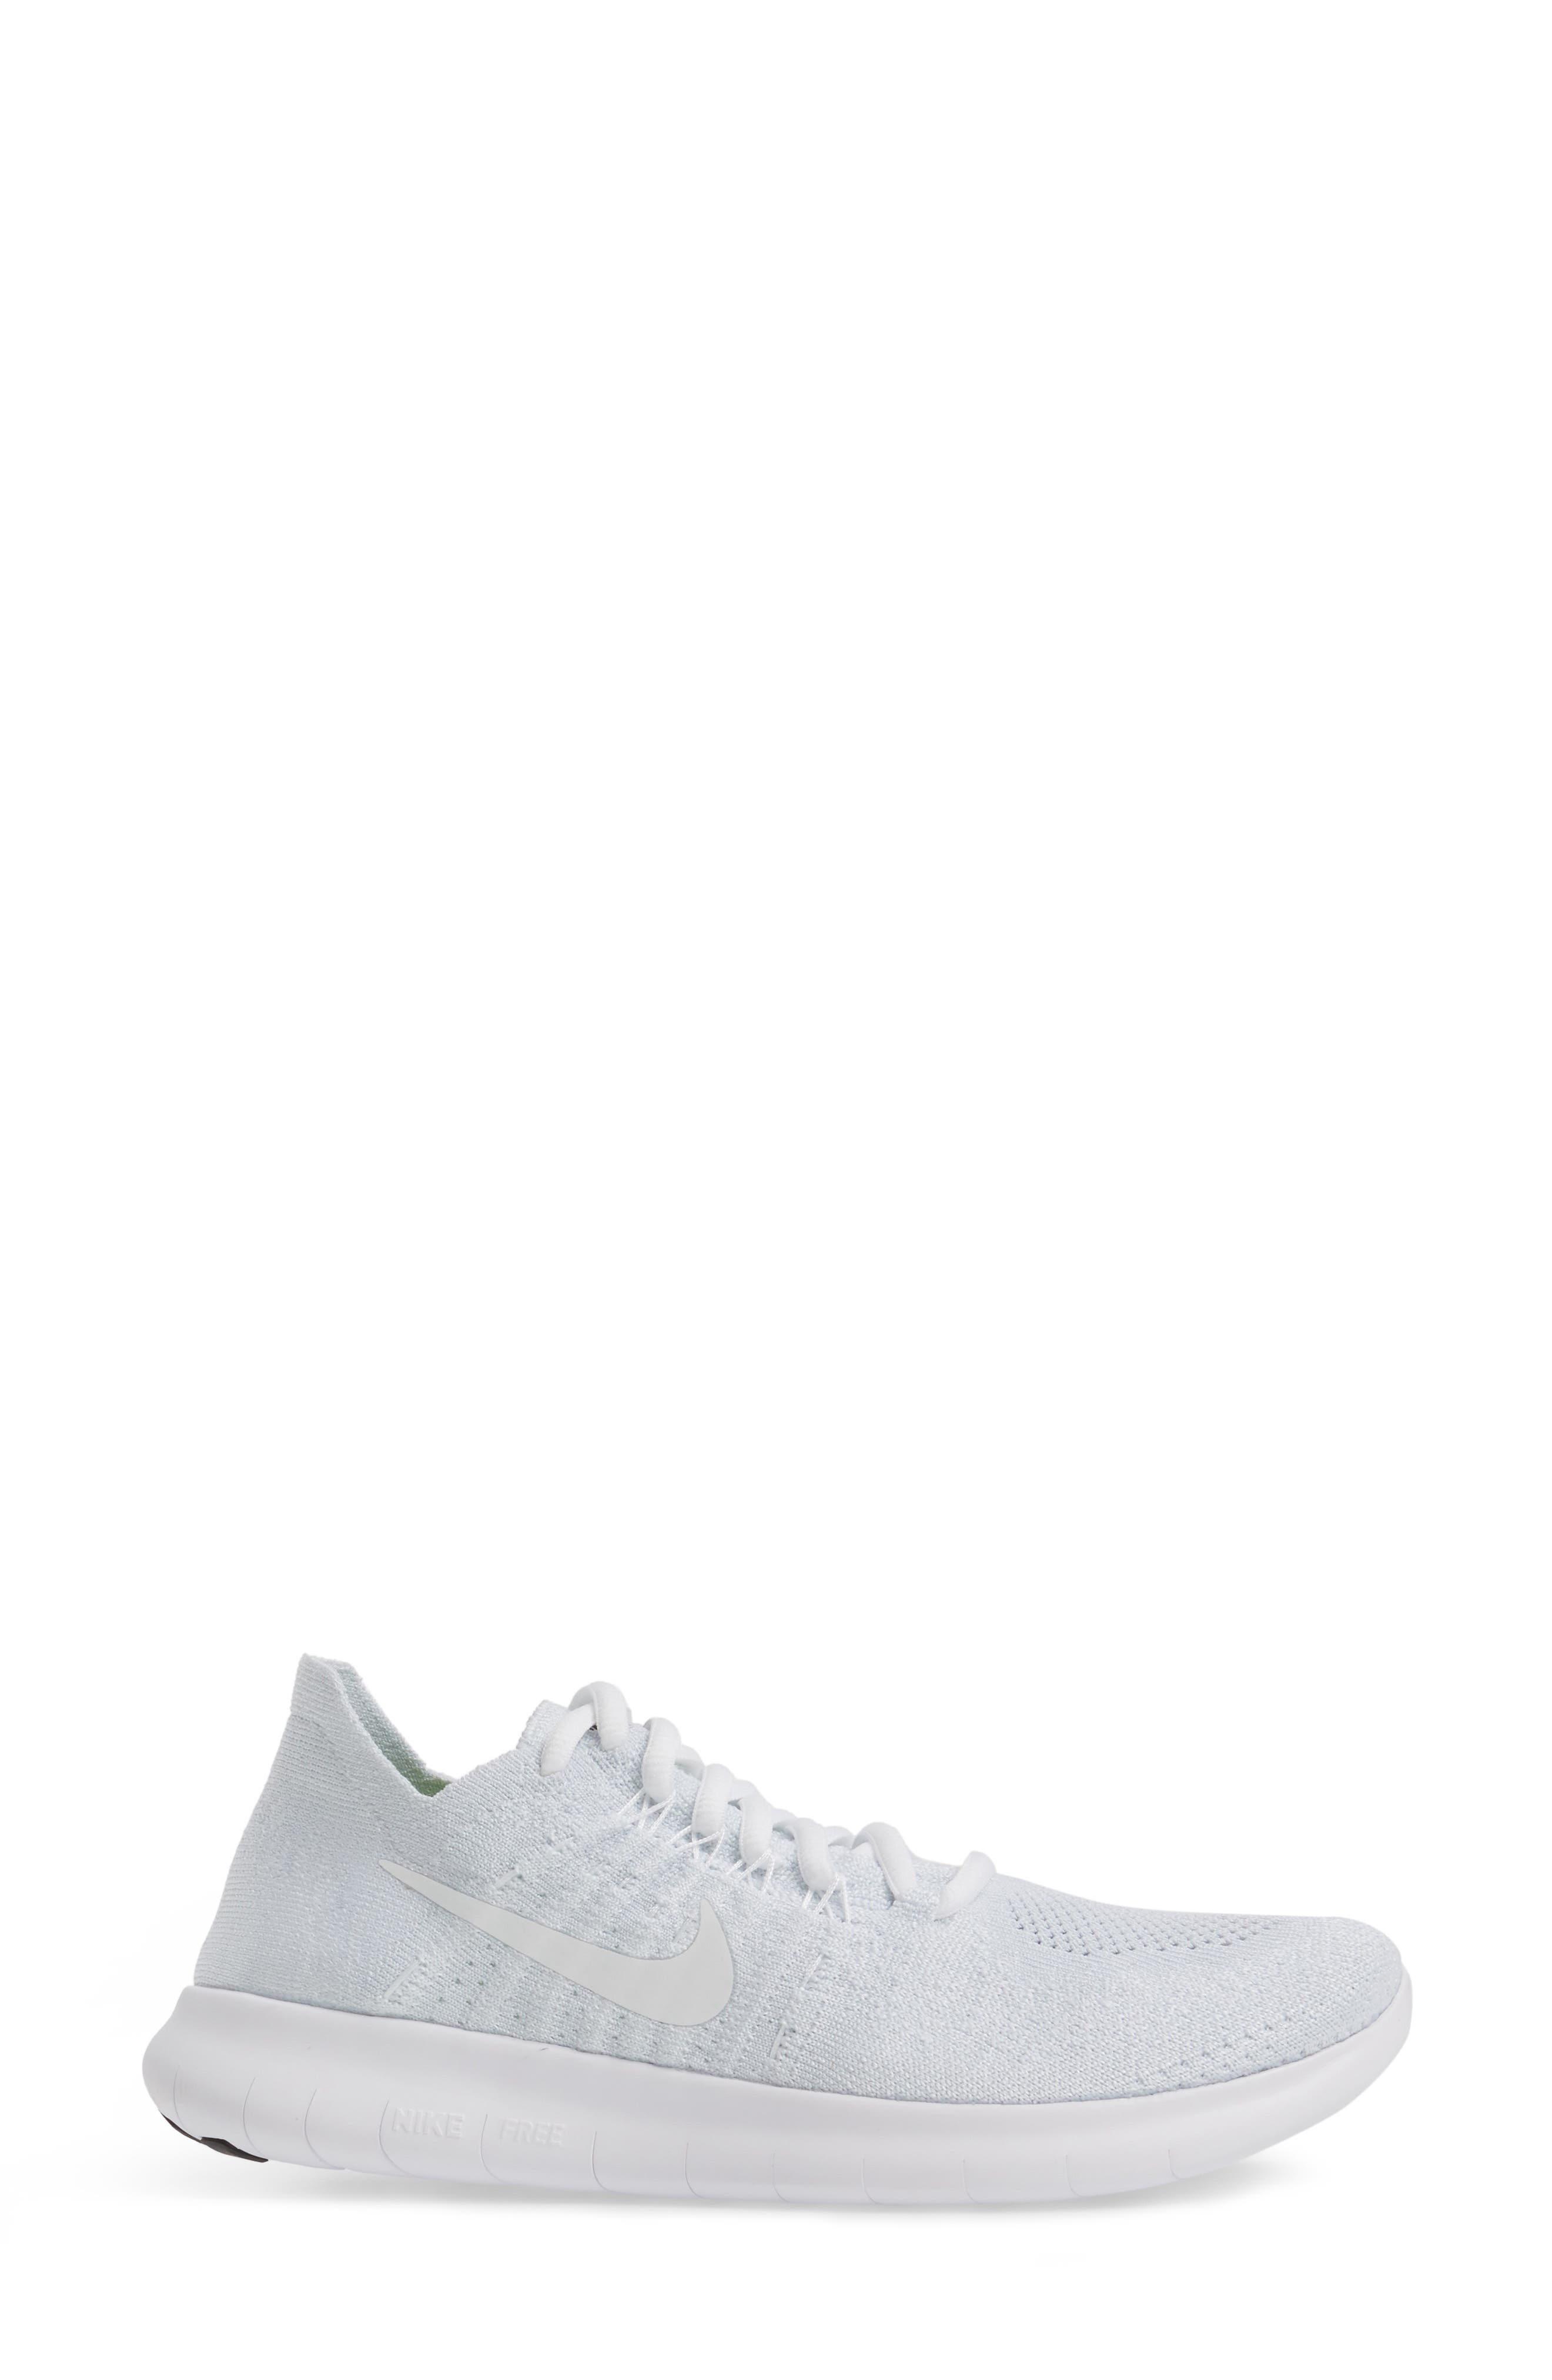 Free Run Flyknit 2 Running Shoe,                             Alternate thumbnail 3, color,                             White/ Platinum/ Black